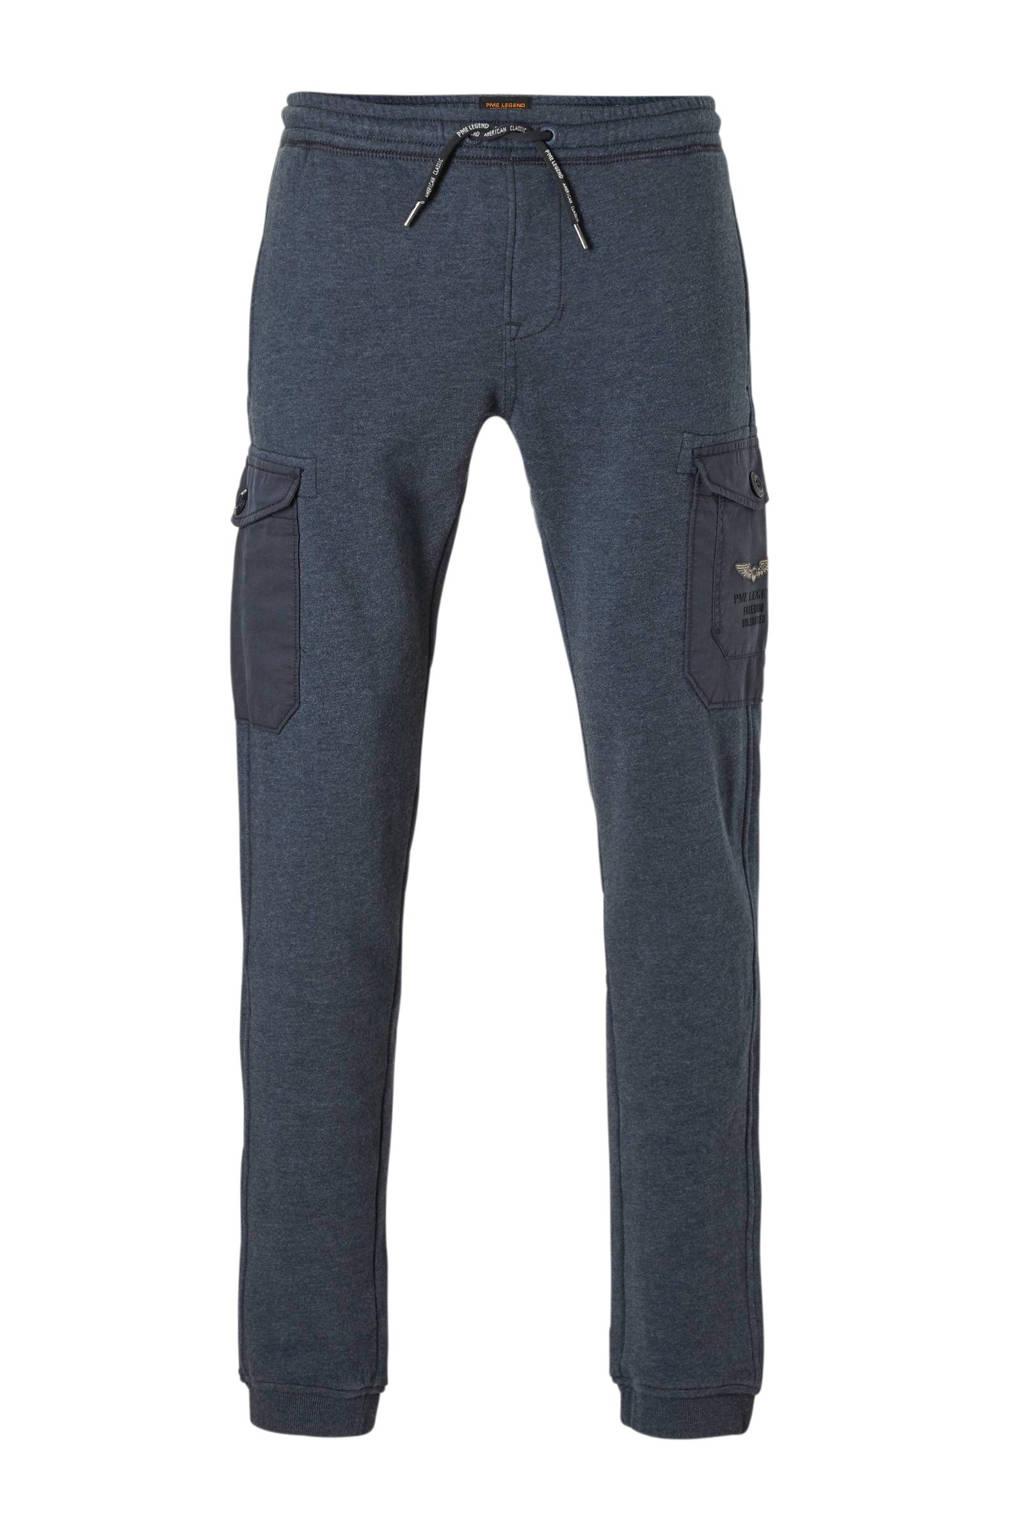 PME Legend sweatpants, Donkerblauw